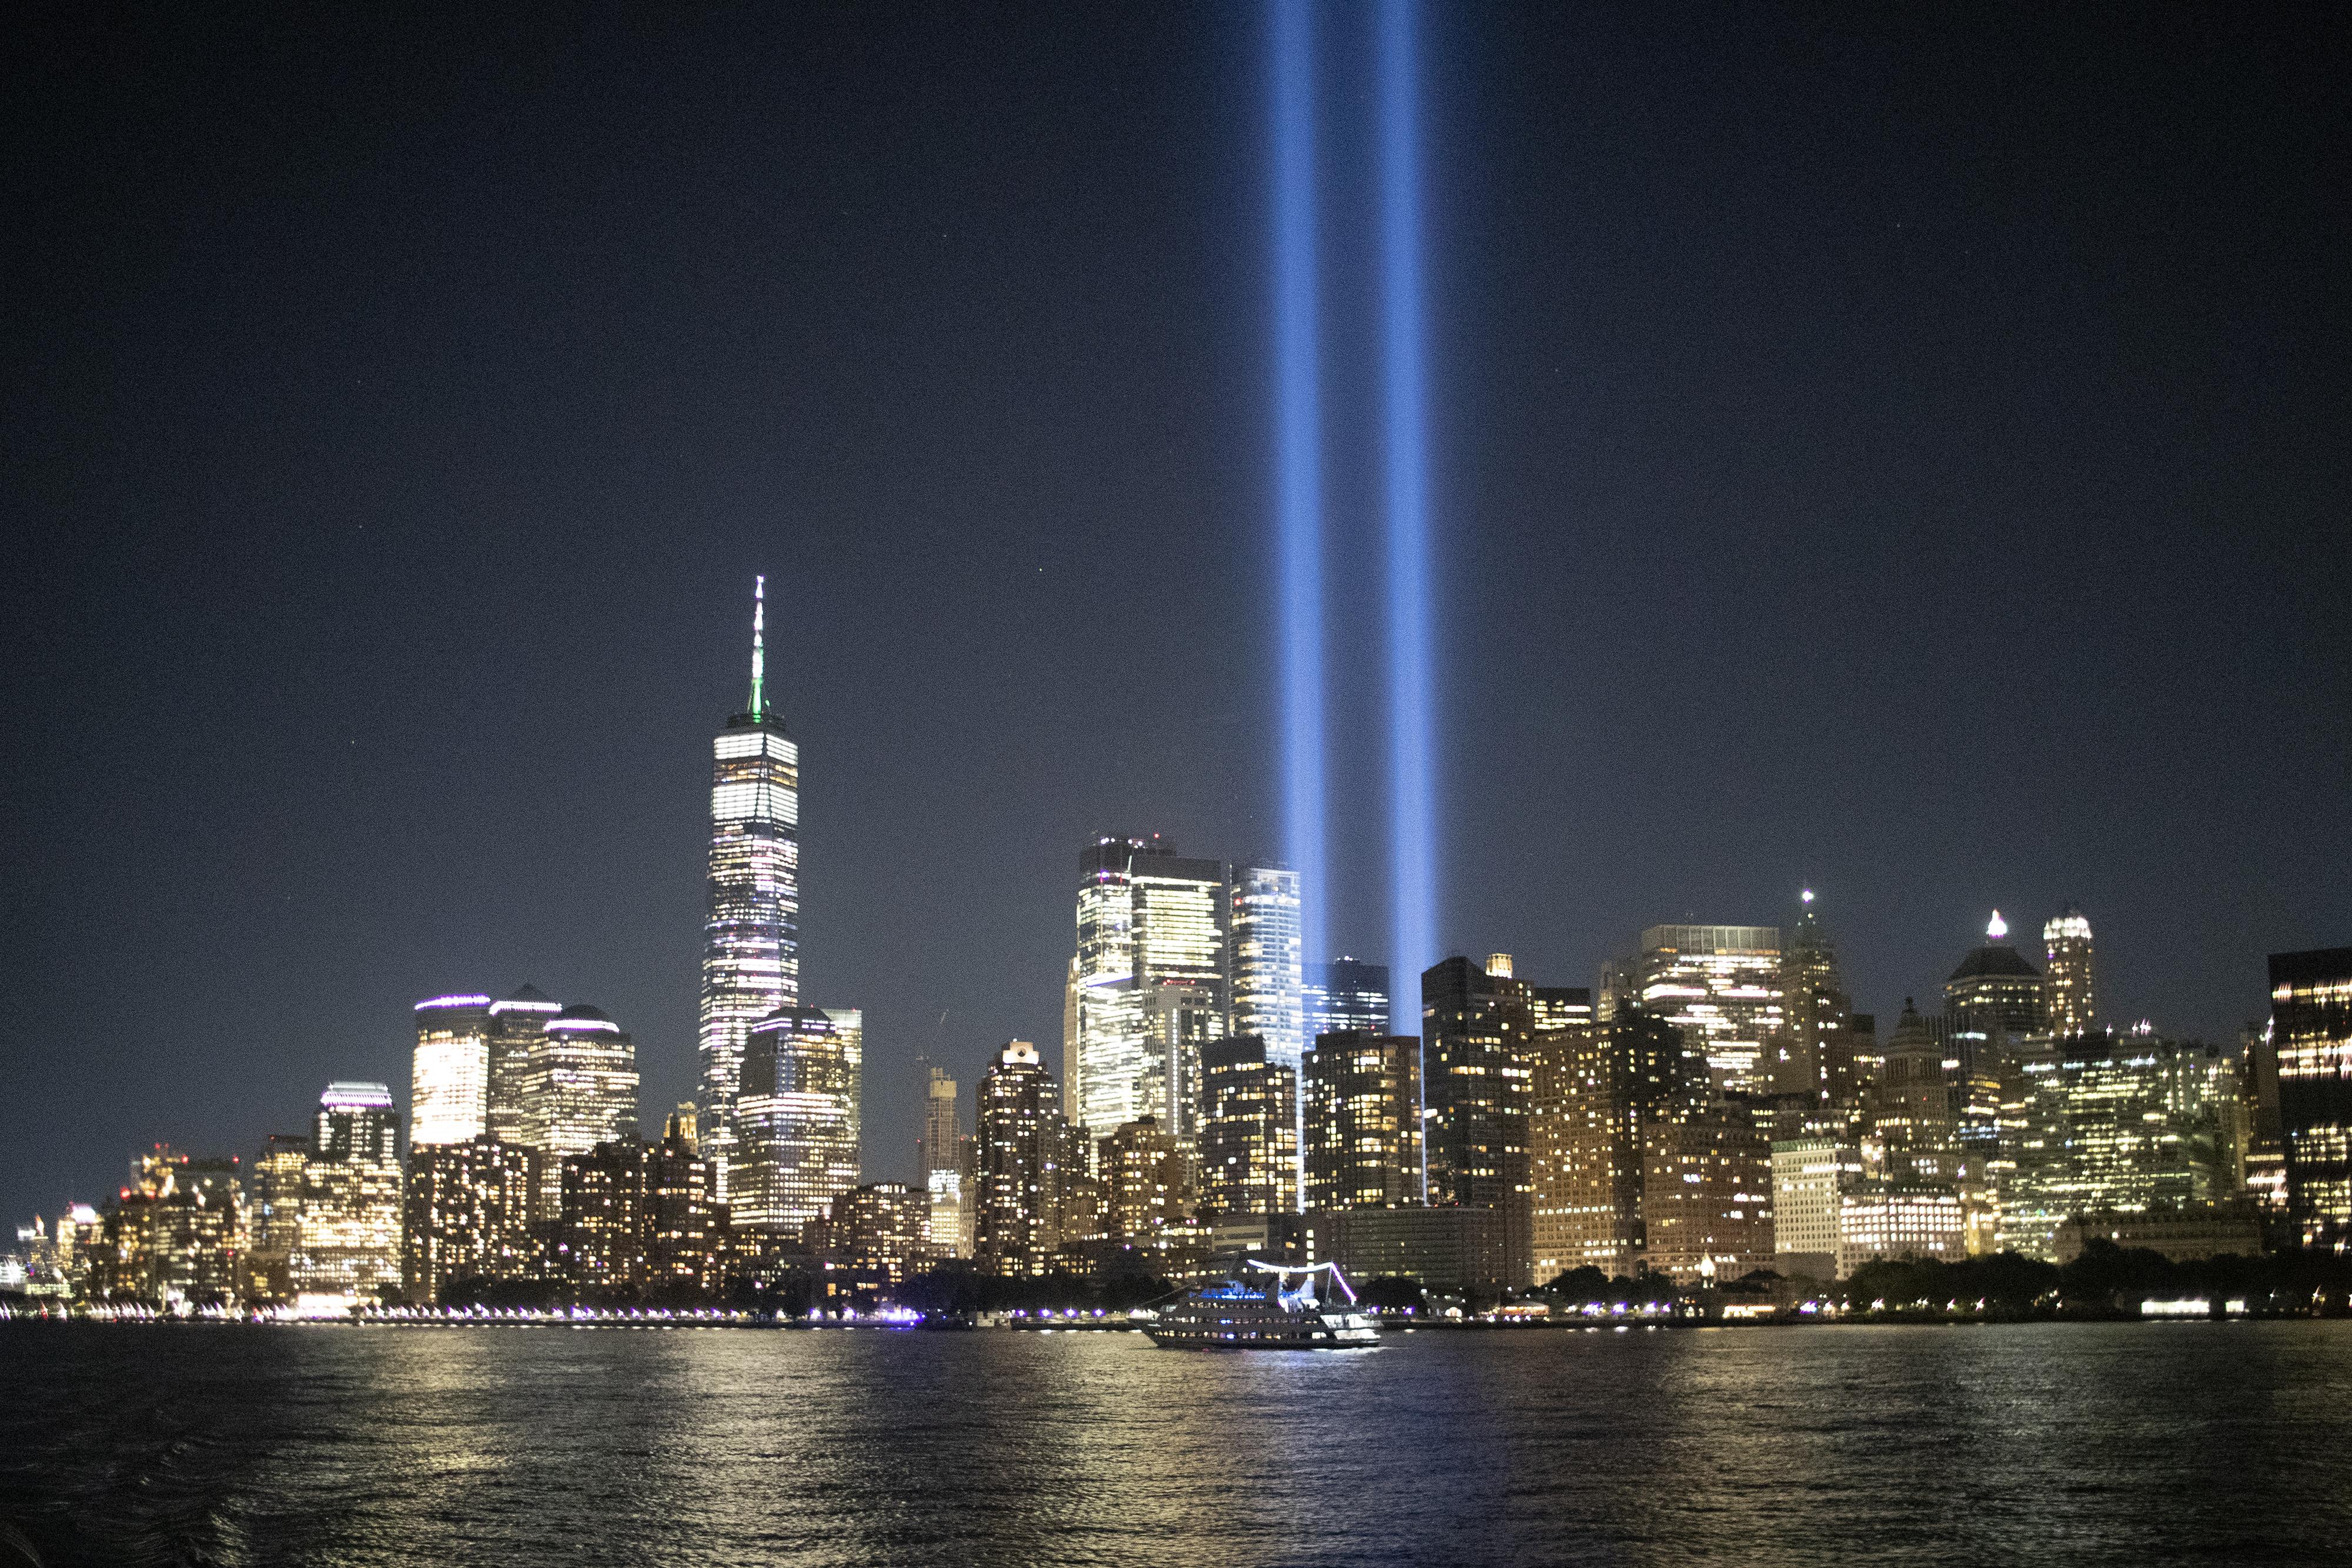 20th Anniversary Of 9/11 Attacks In New York